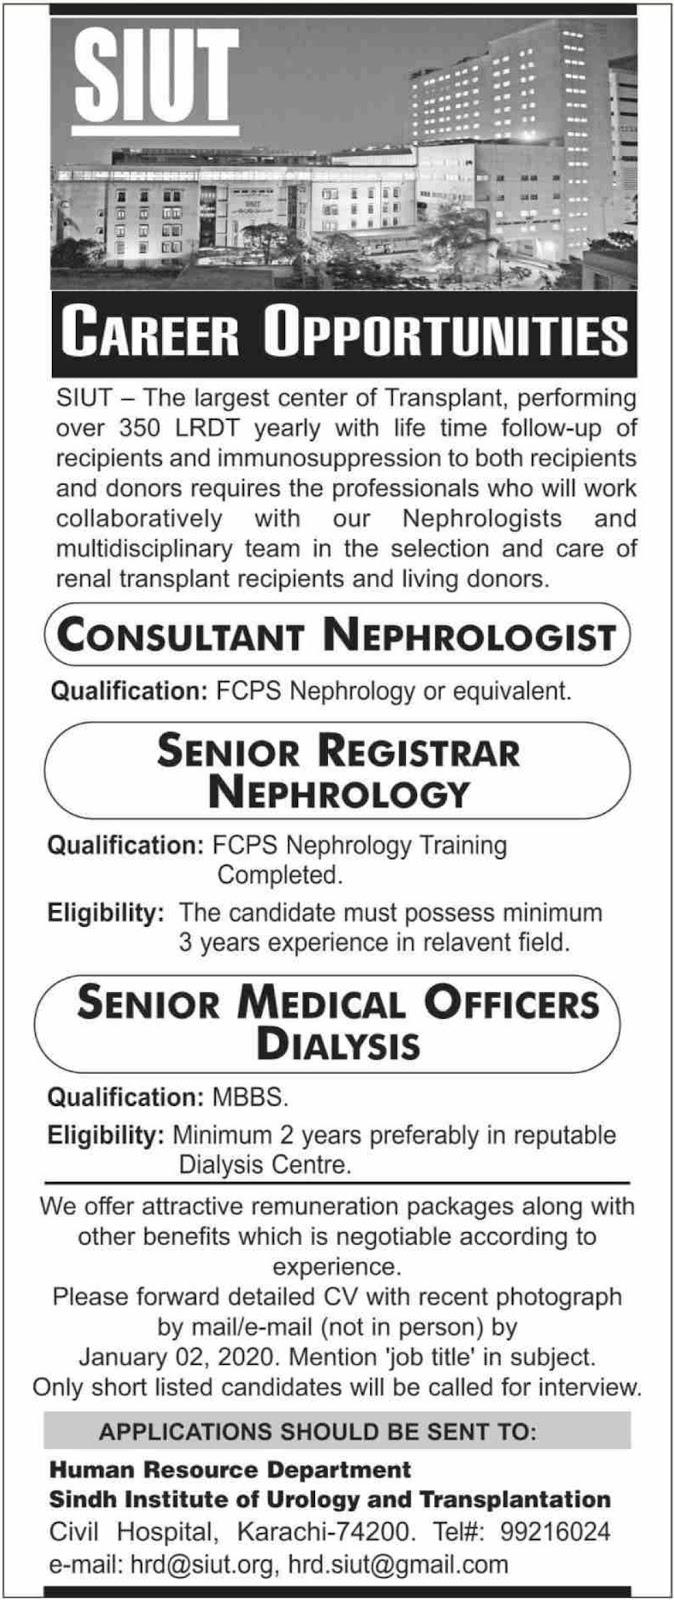 Sindh Institute of Urology & Transplantation SIUT Karachi Jobs 2019 Latest